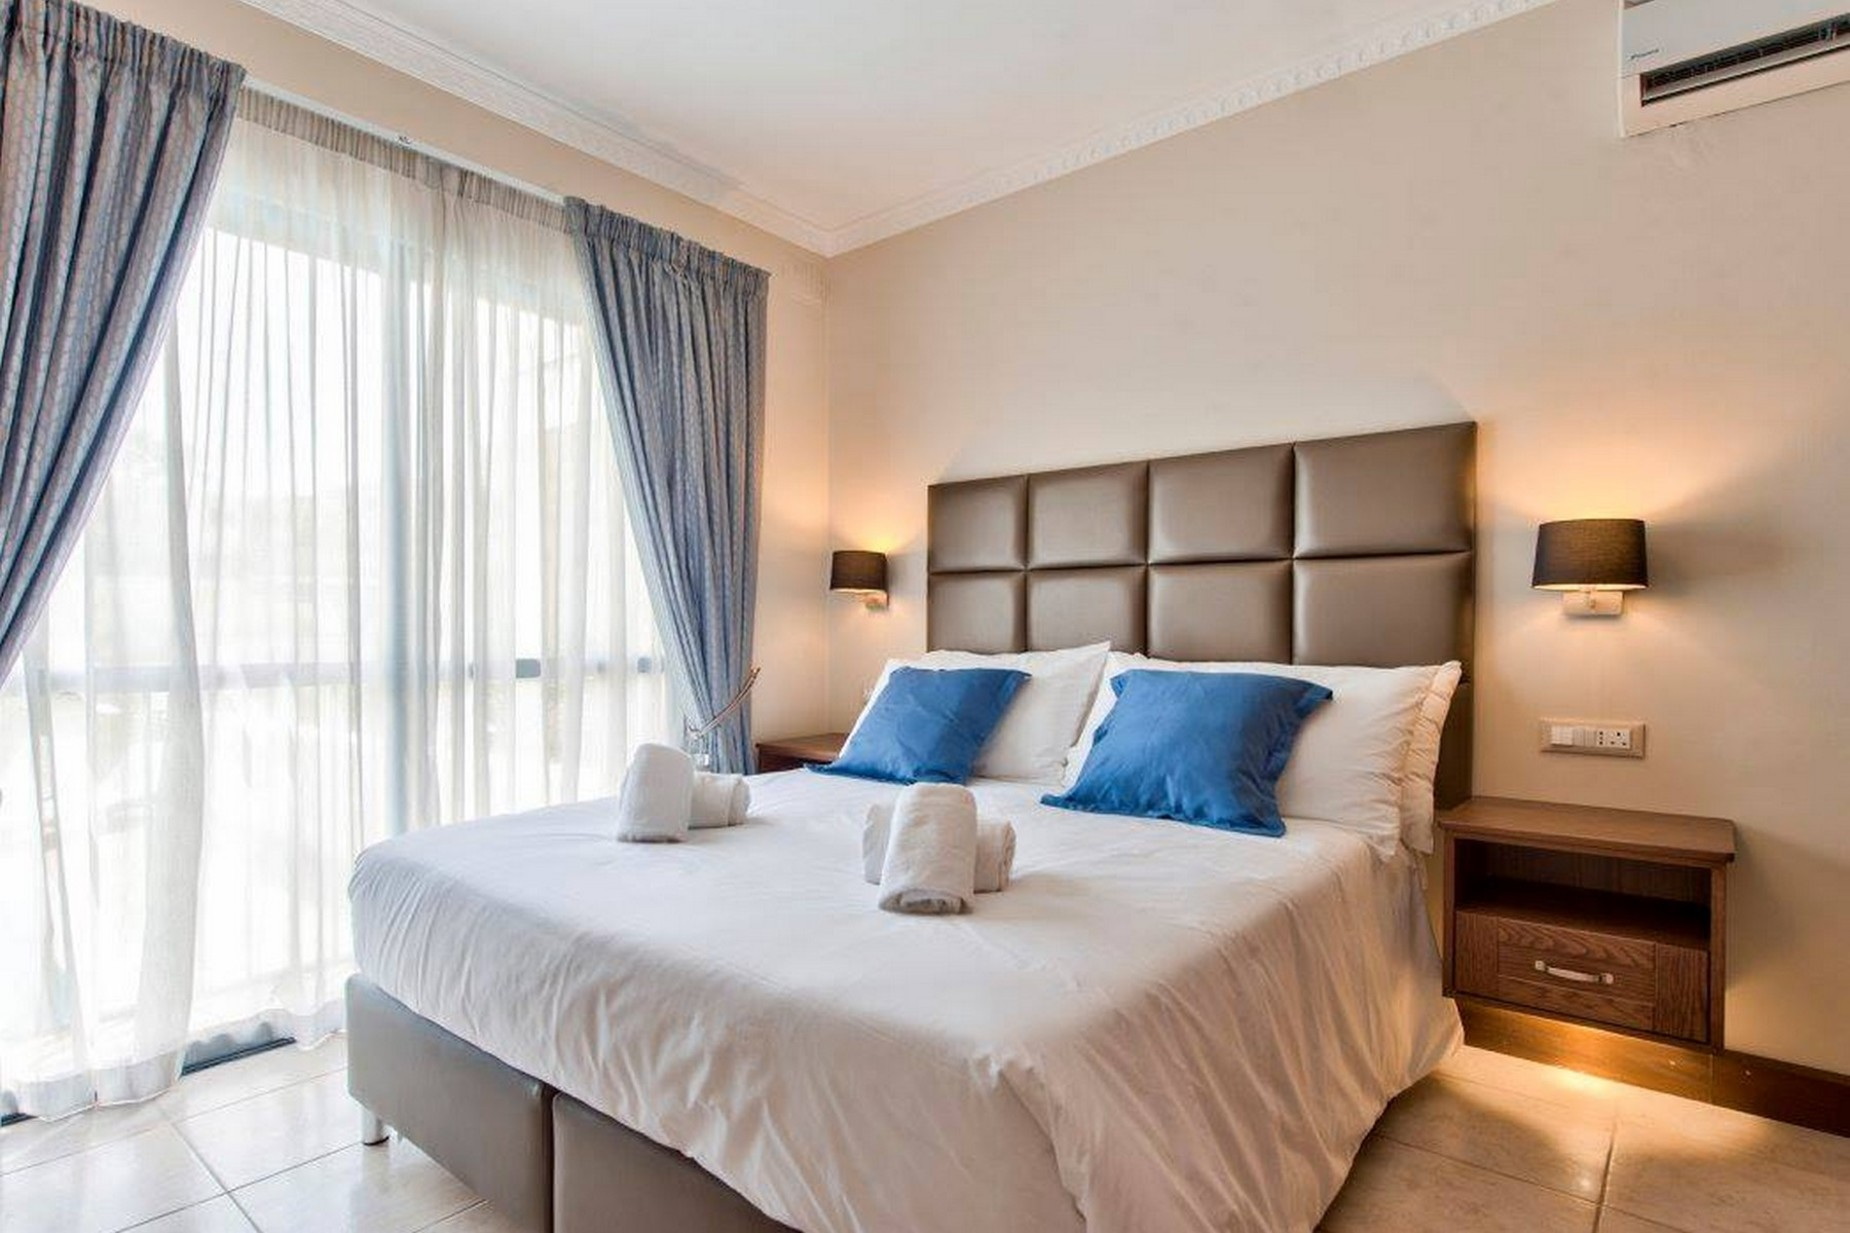 2 bed Villa For Rent in Mellieha, Mellieha - thumb 7